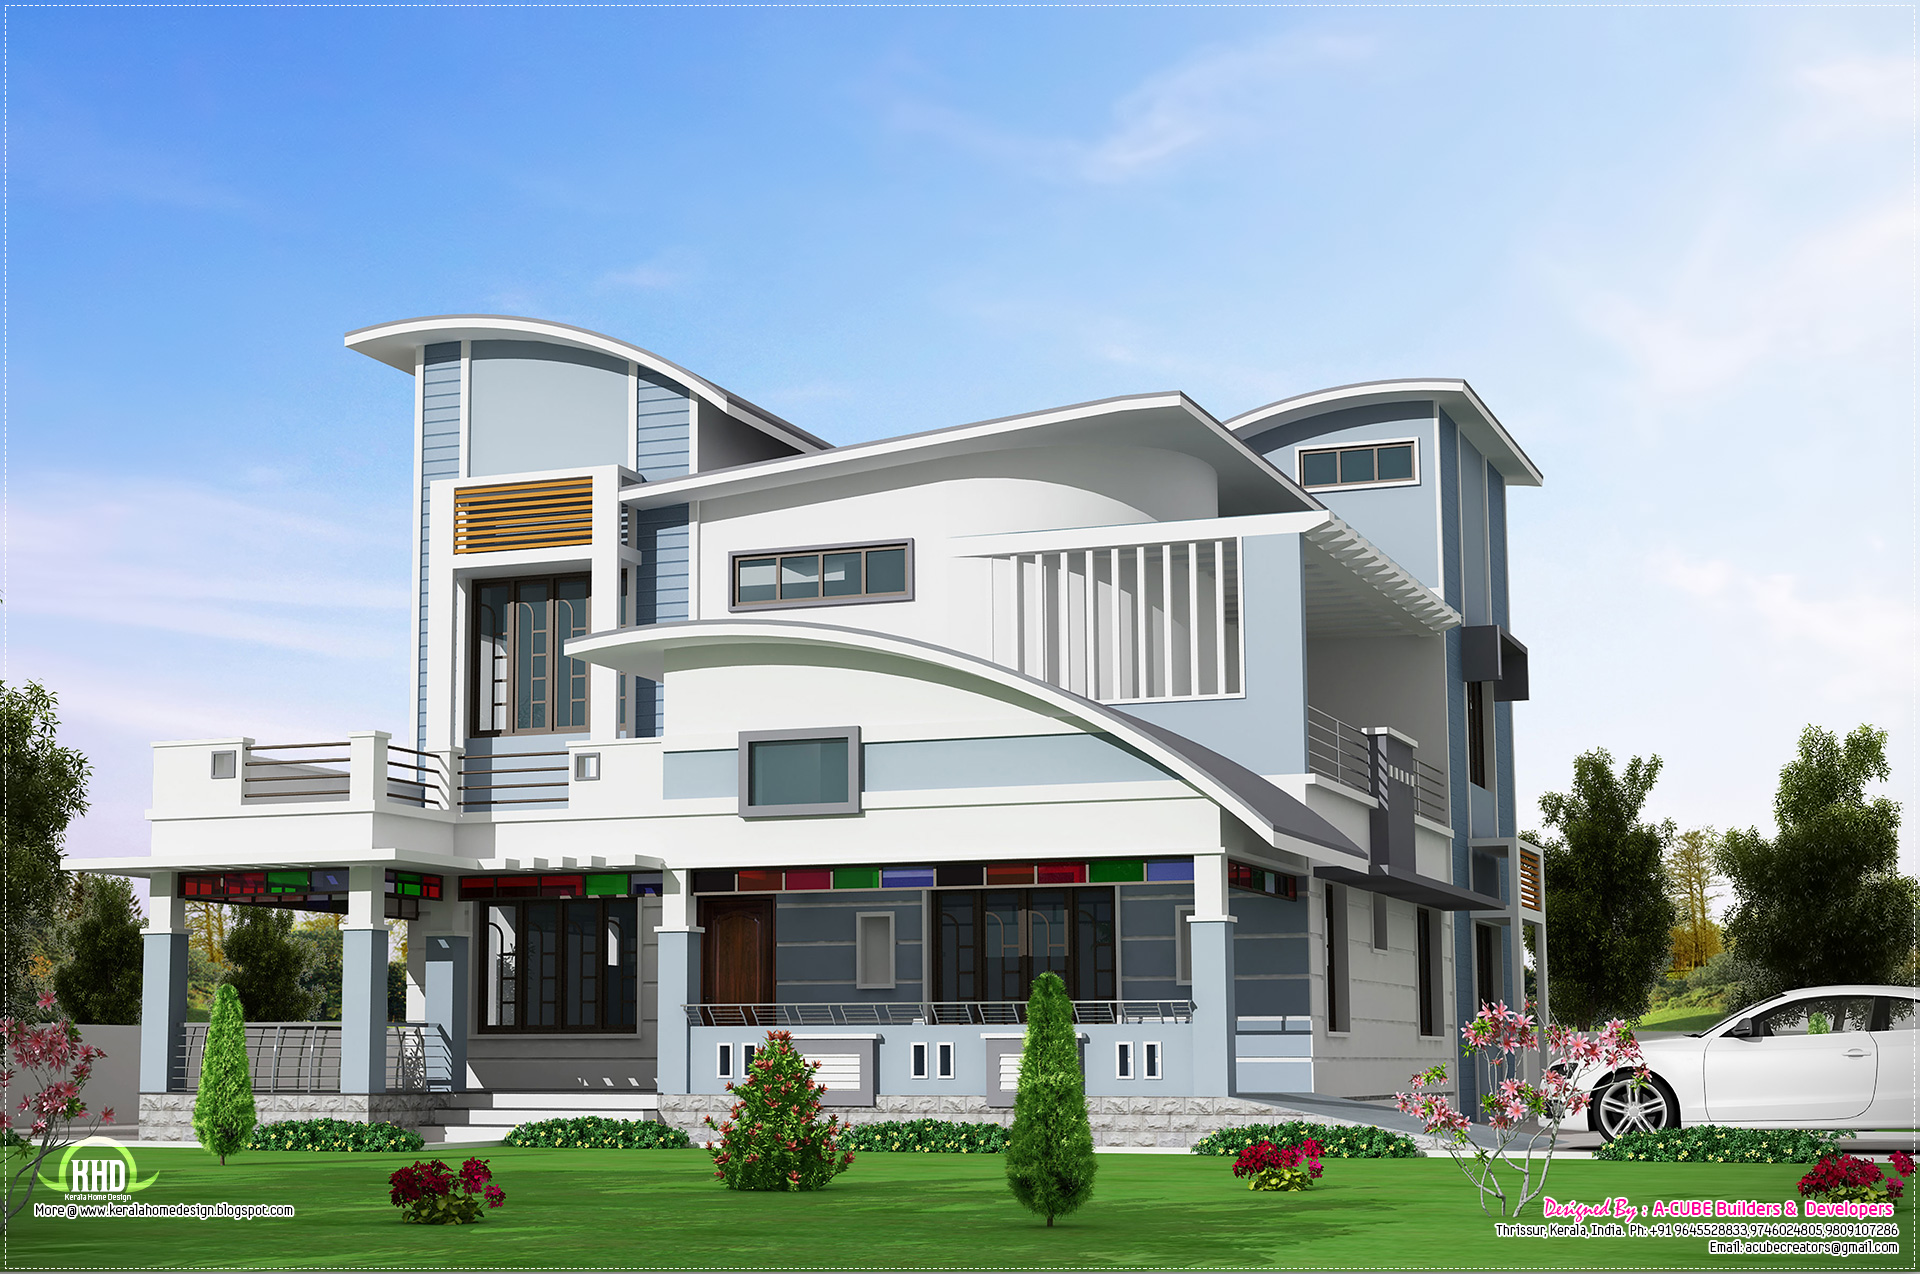 Modern unique style villa design kerala home design and for Villa type house plans